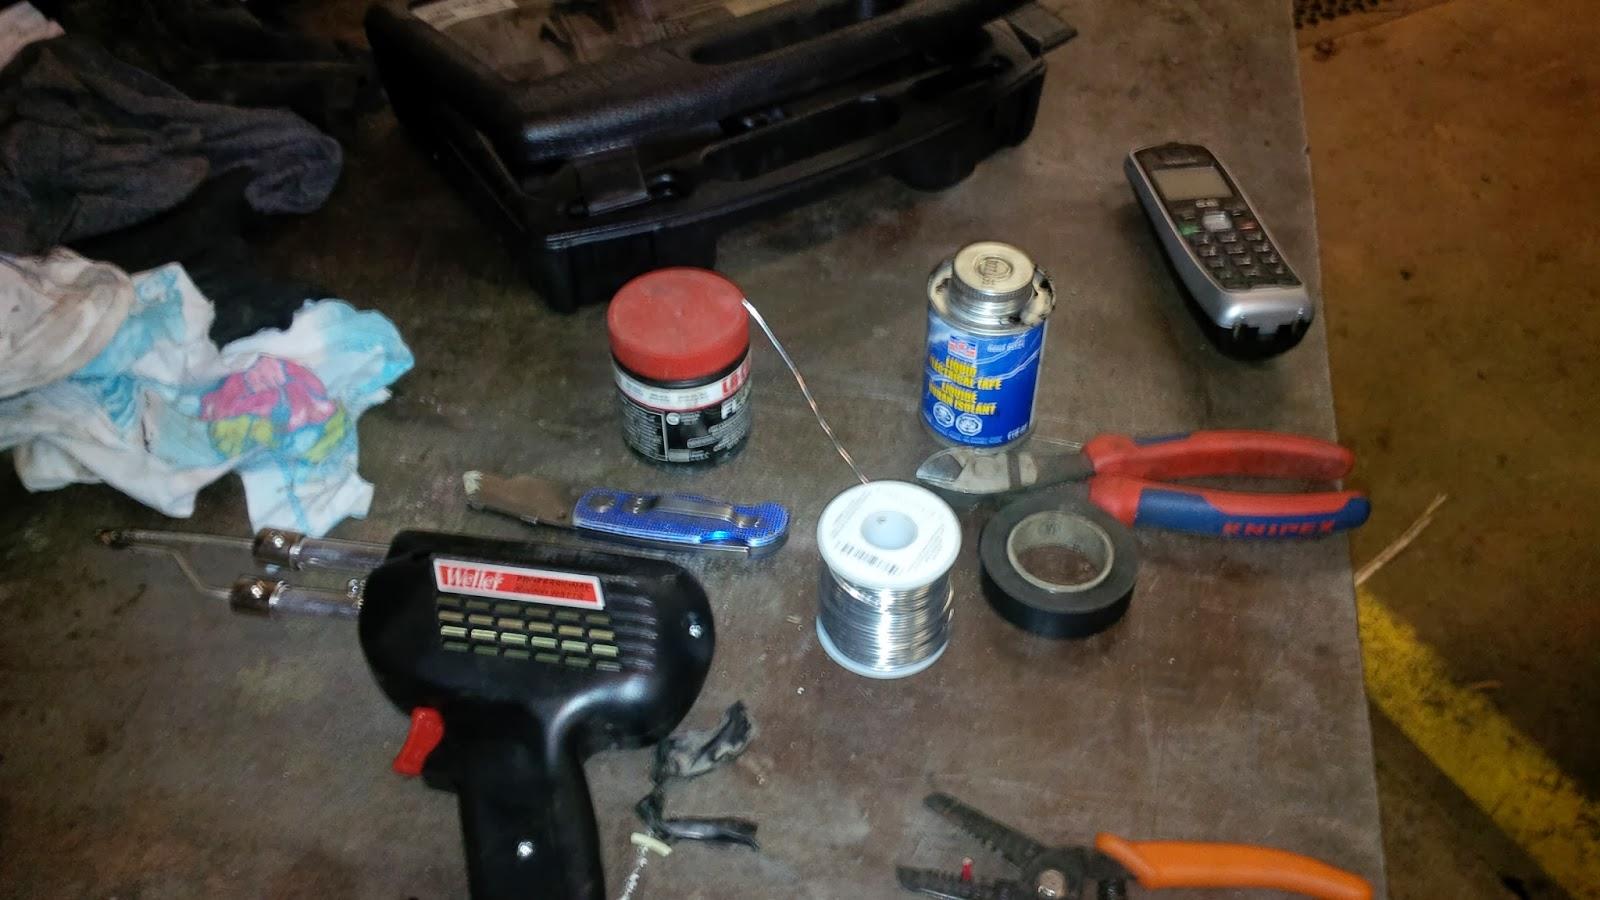 Bobs Shop Pro Gator 2020 Wiring Revisit John Deere Harness